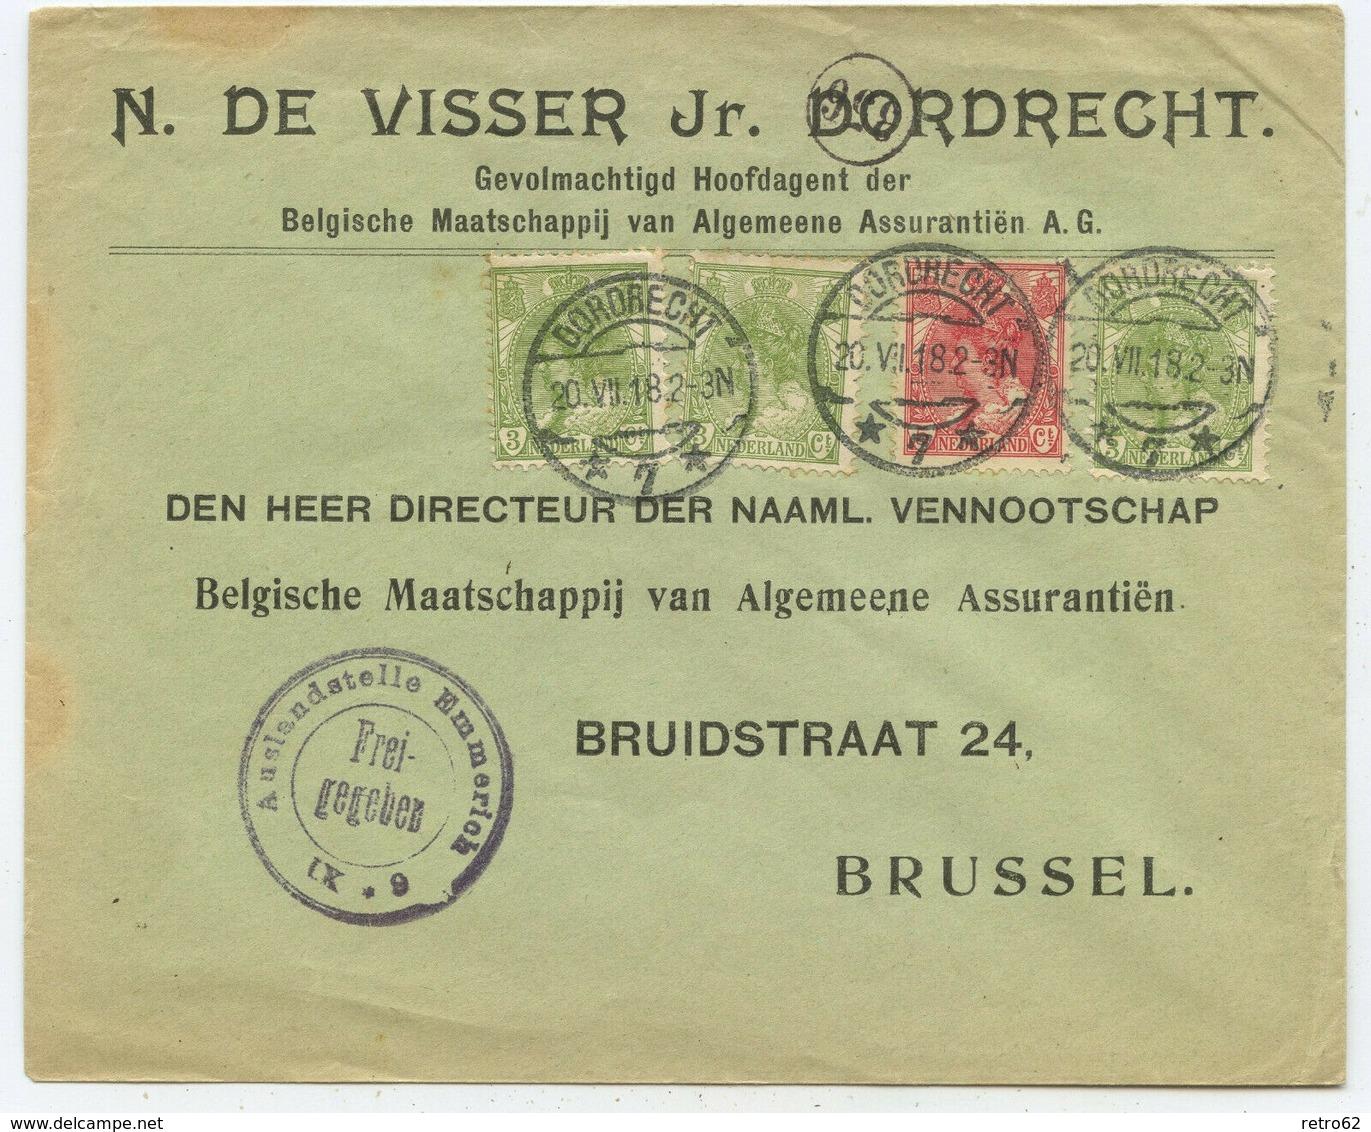 Niederlande Zensur Brief Dordrecht Brüssel Belgien 1918 - Briefe U. Dokumente